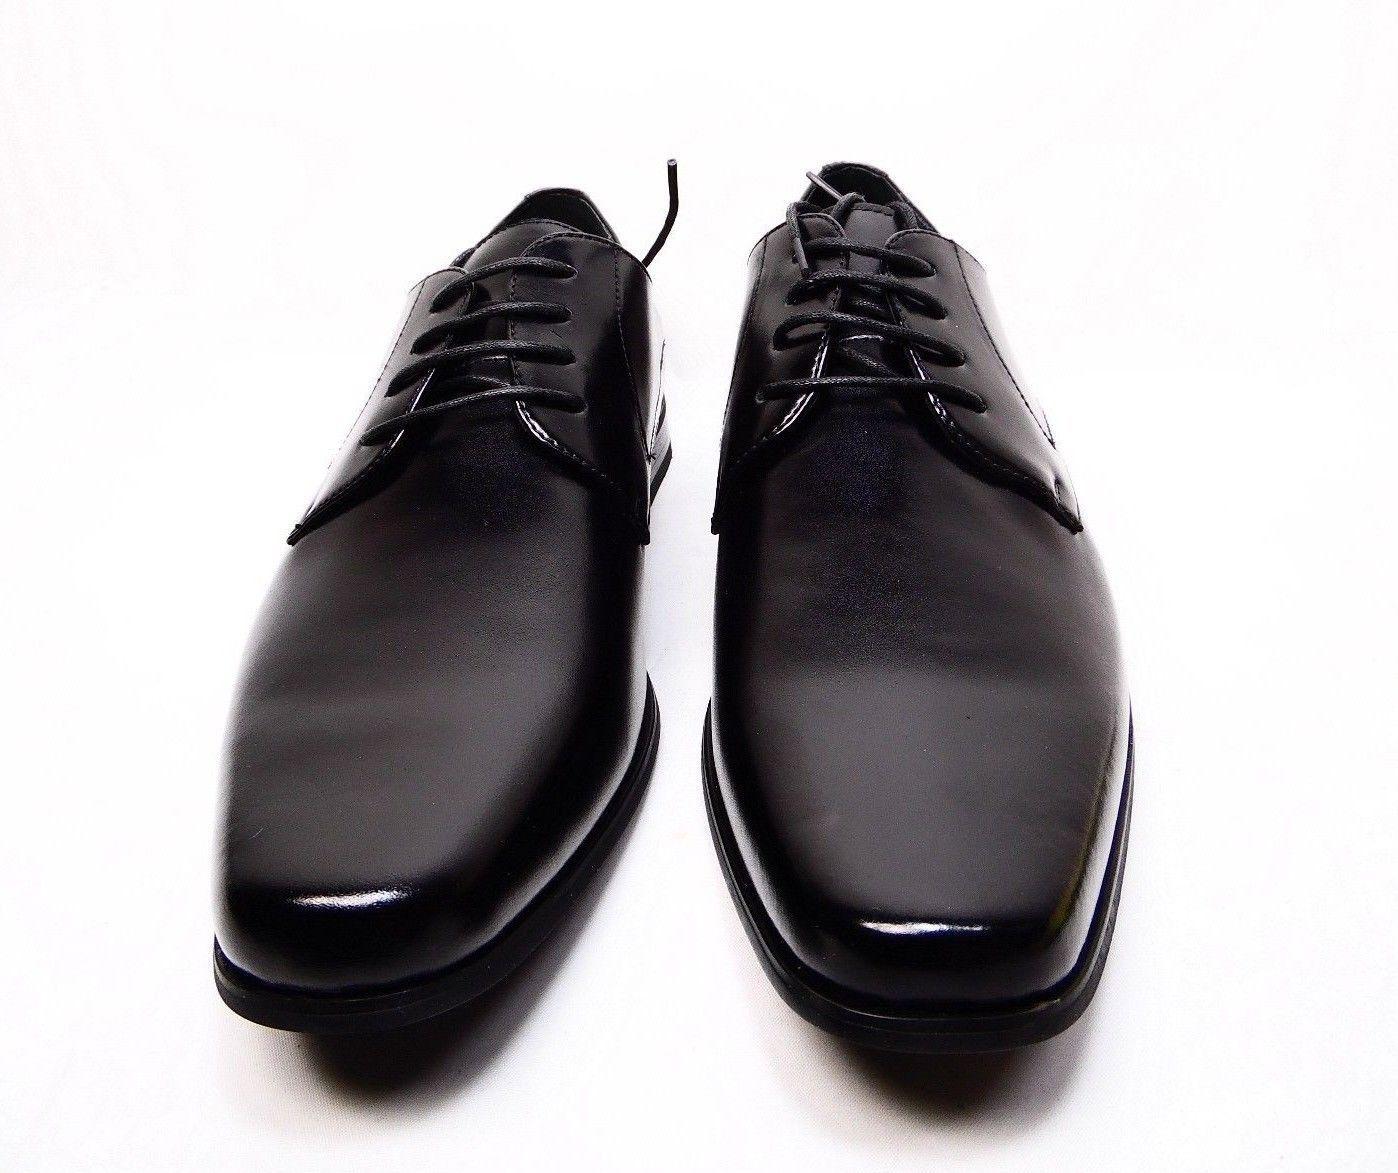 Stacy Adams Carmichael Oxford Black Size 13M - £44.32 GBP